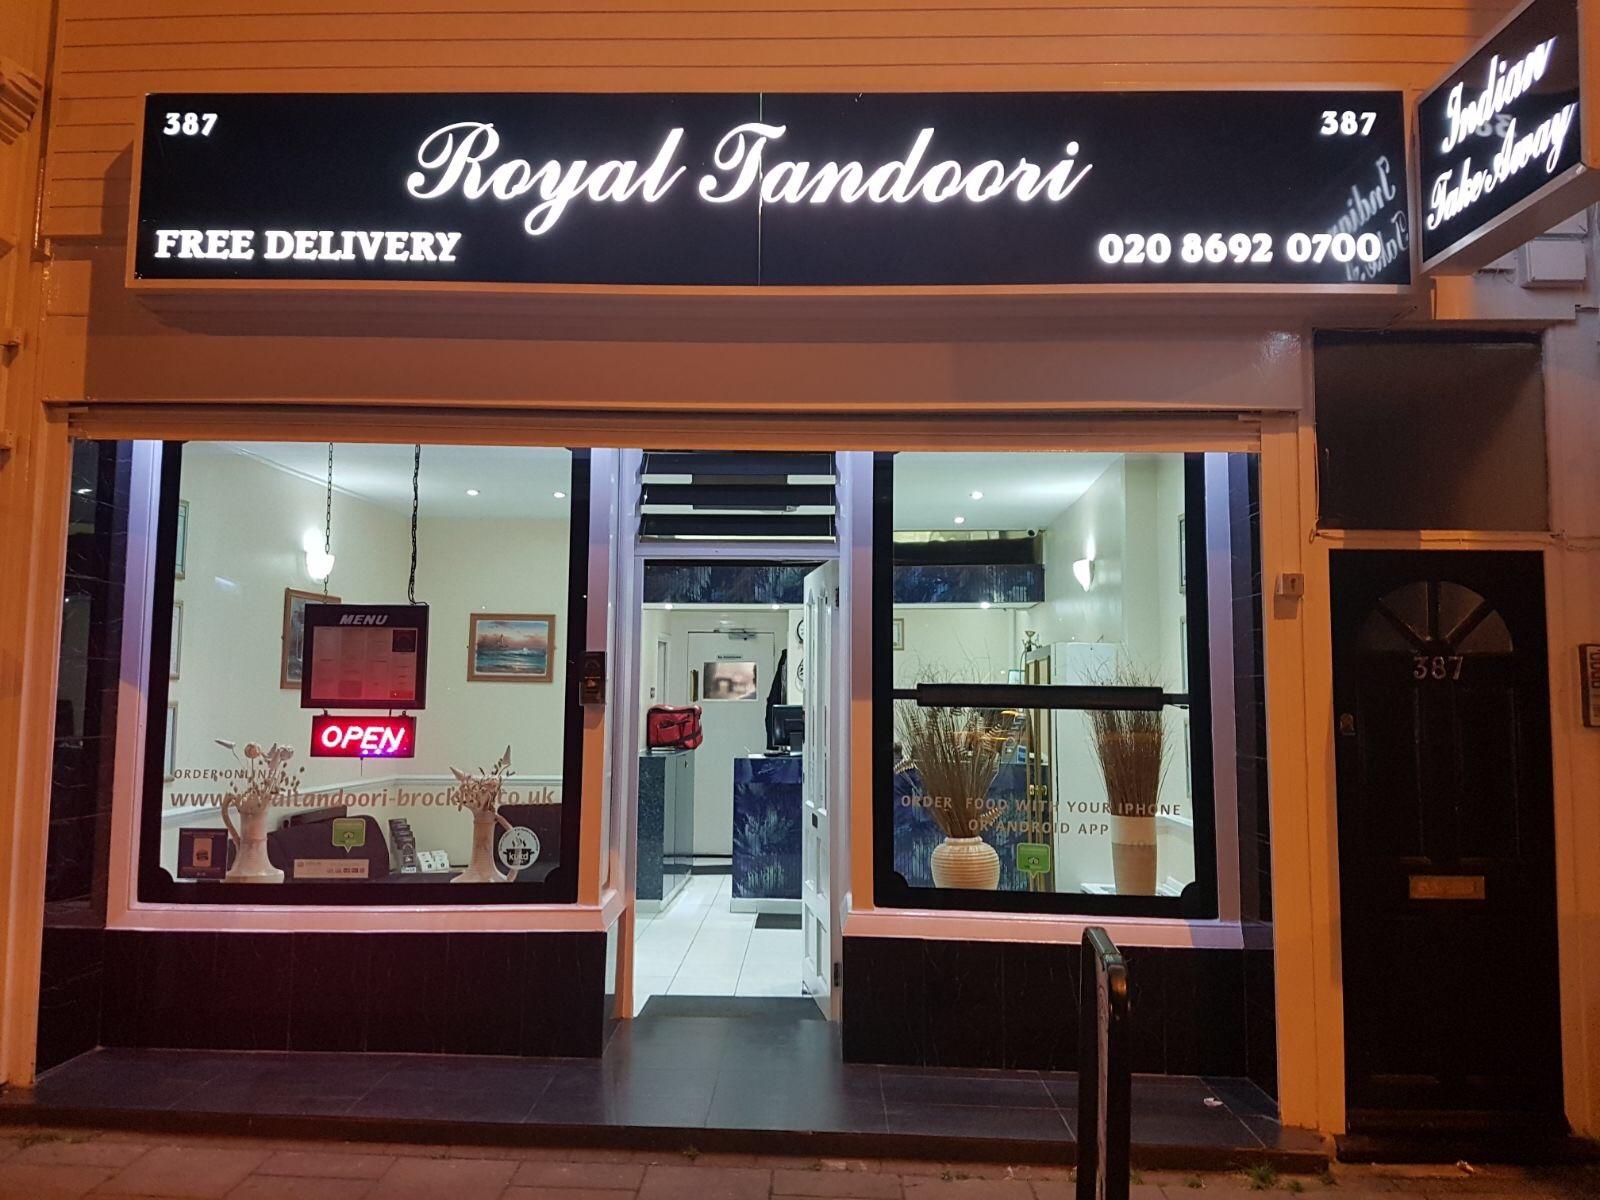 Takeaway front royal tandoori se4